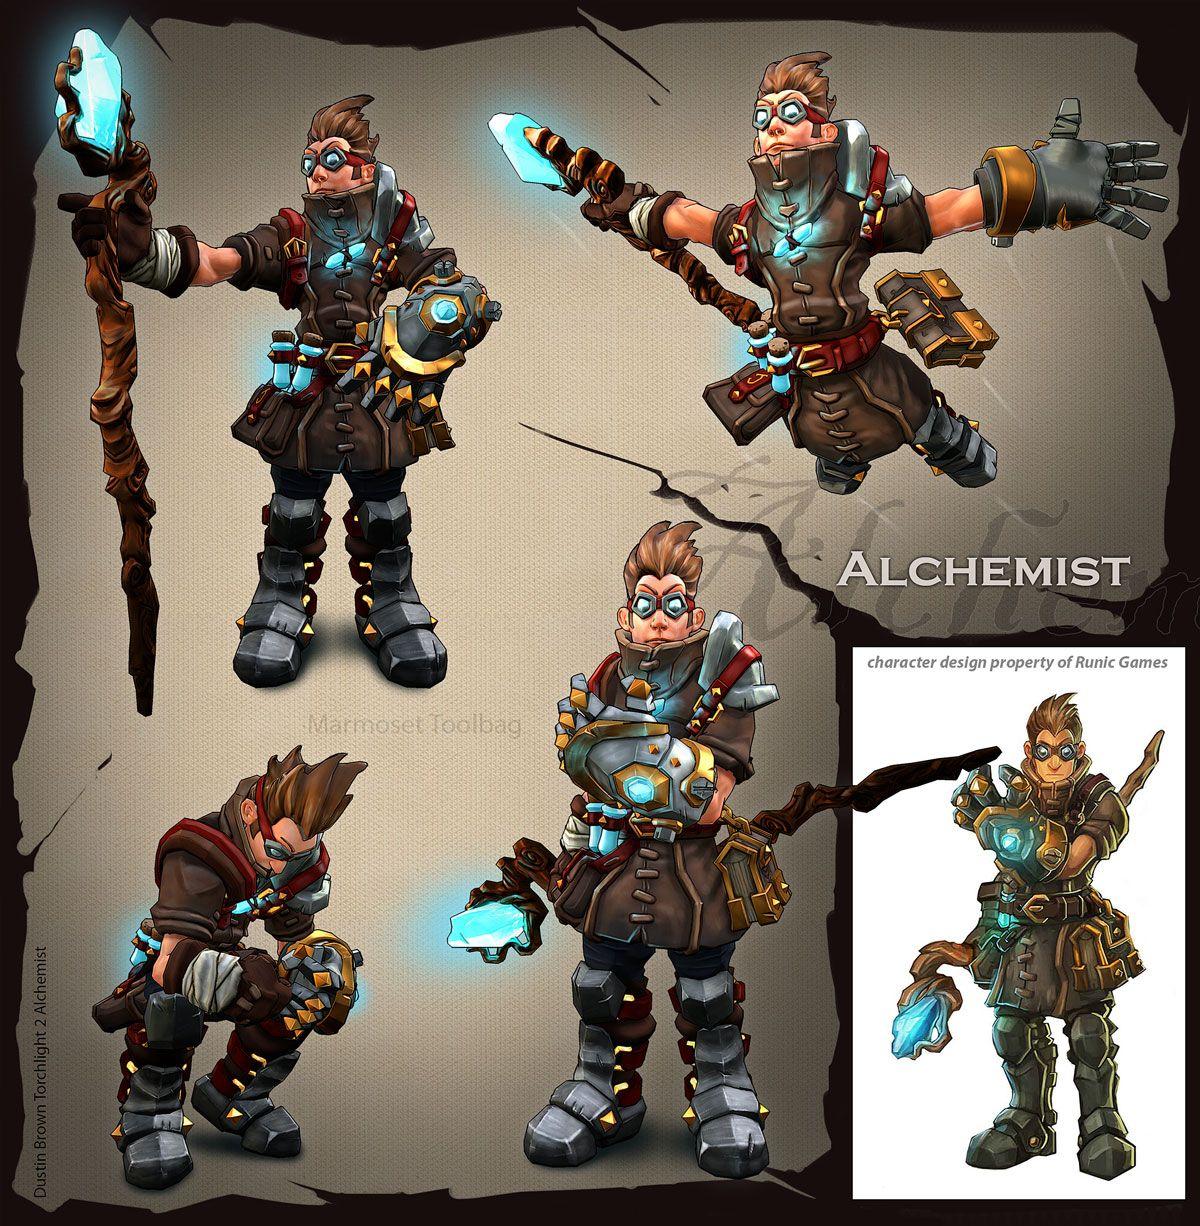 Alchemist fan art – Torchlight 2